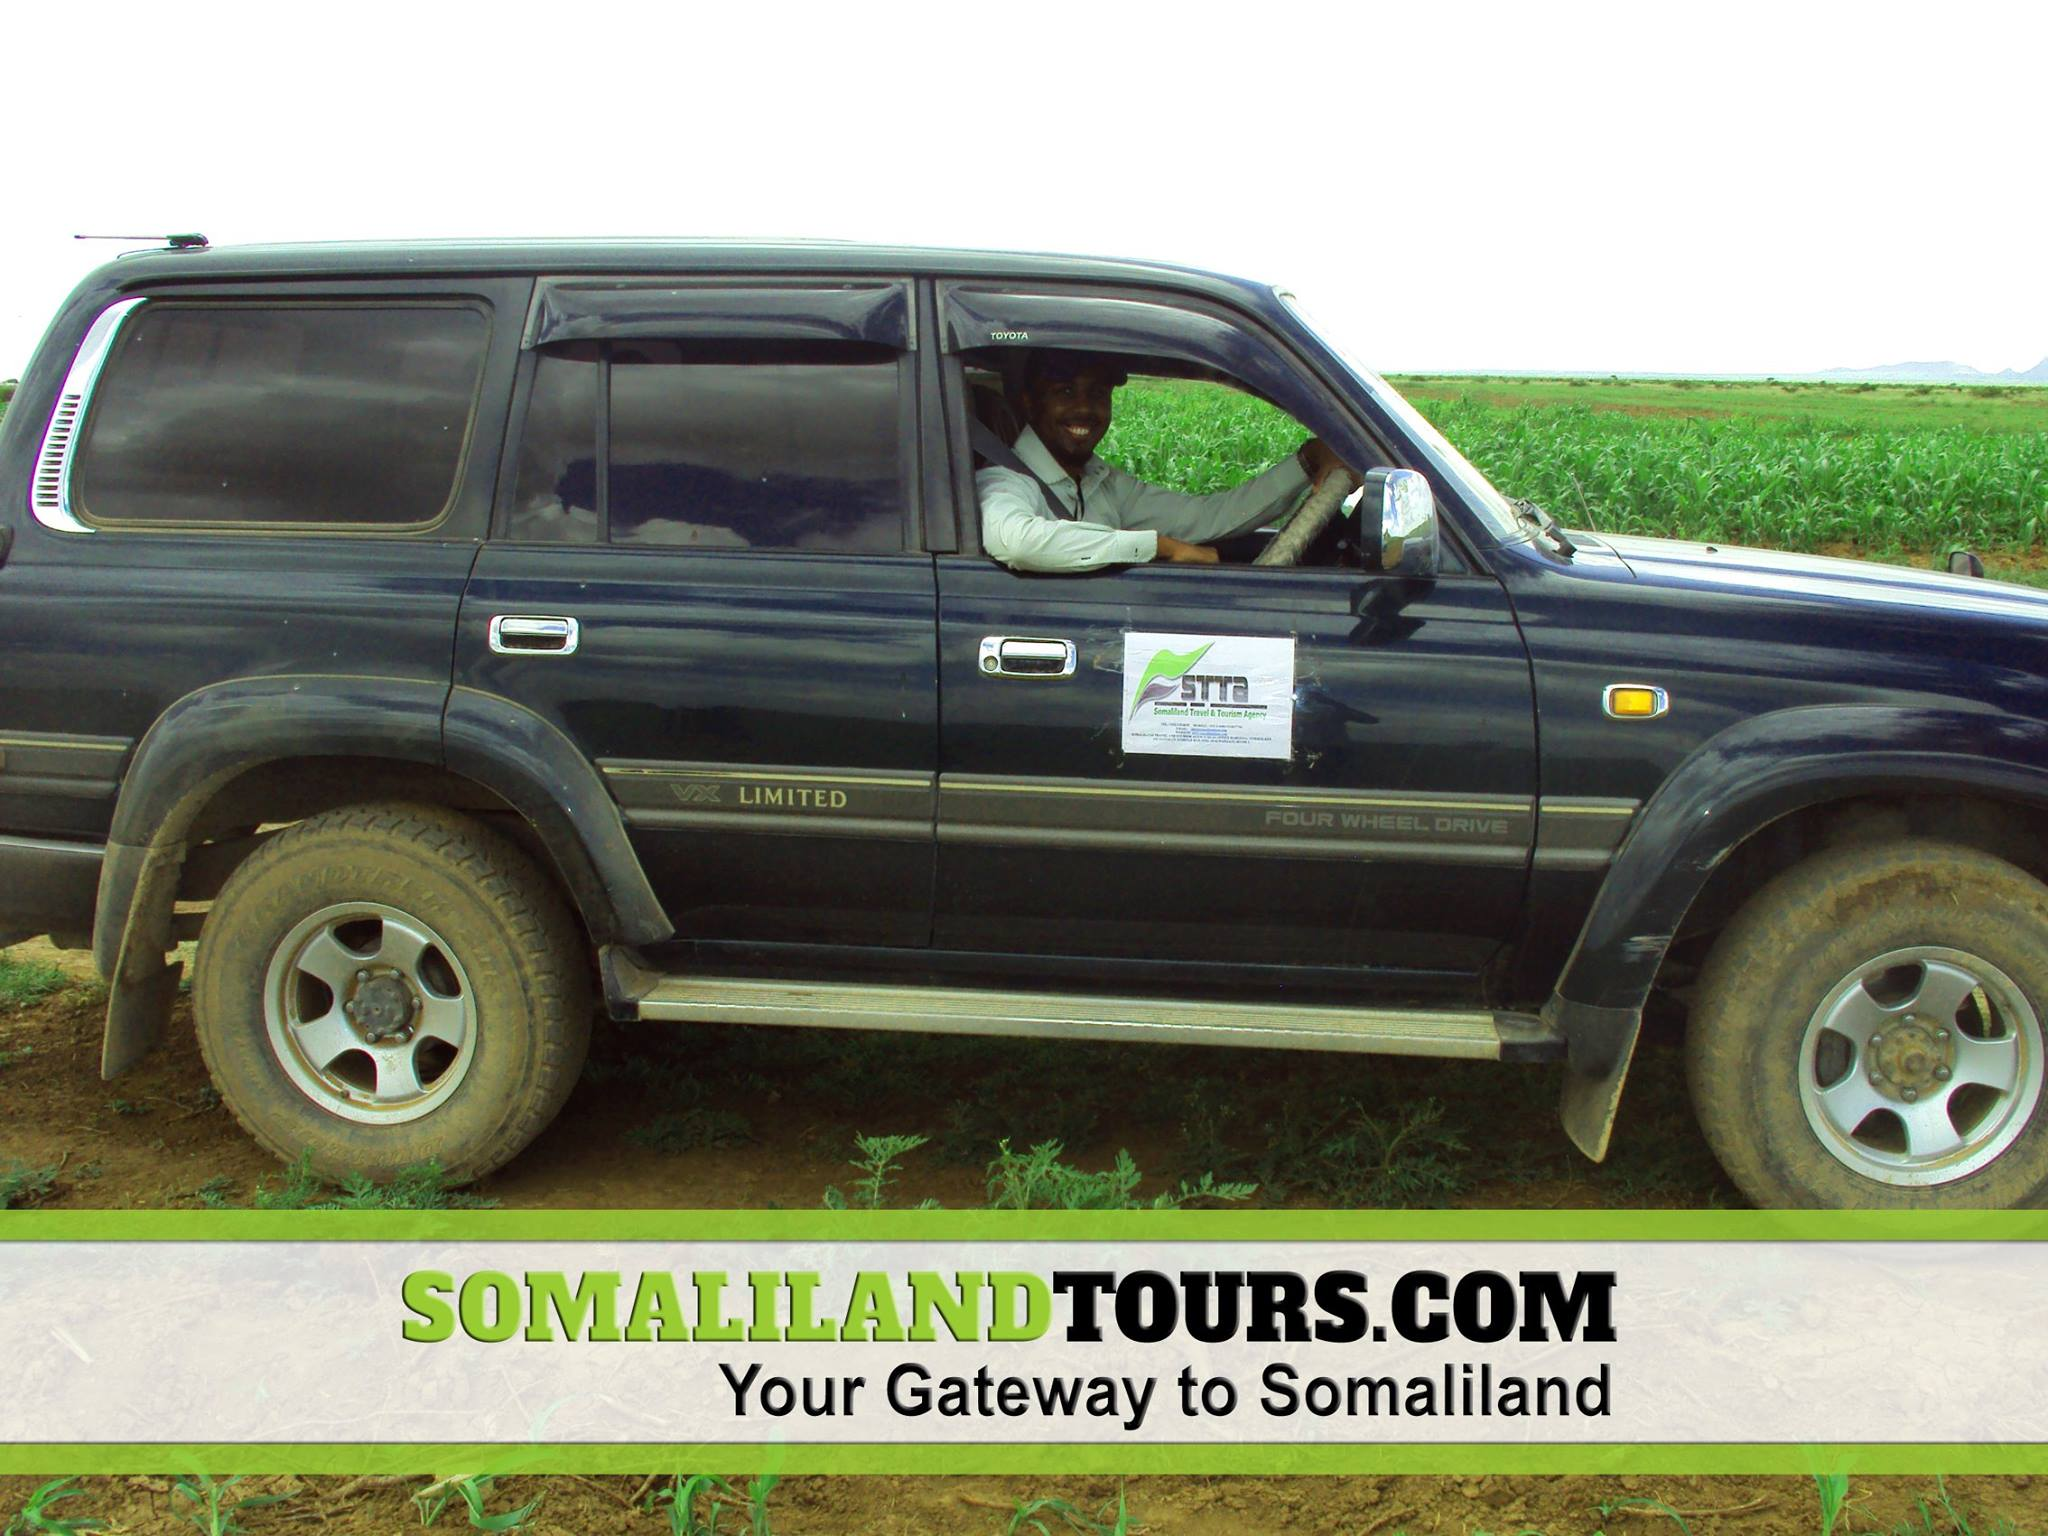 somalilandtours.com